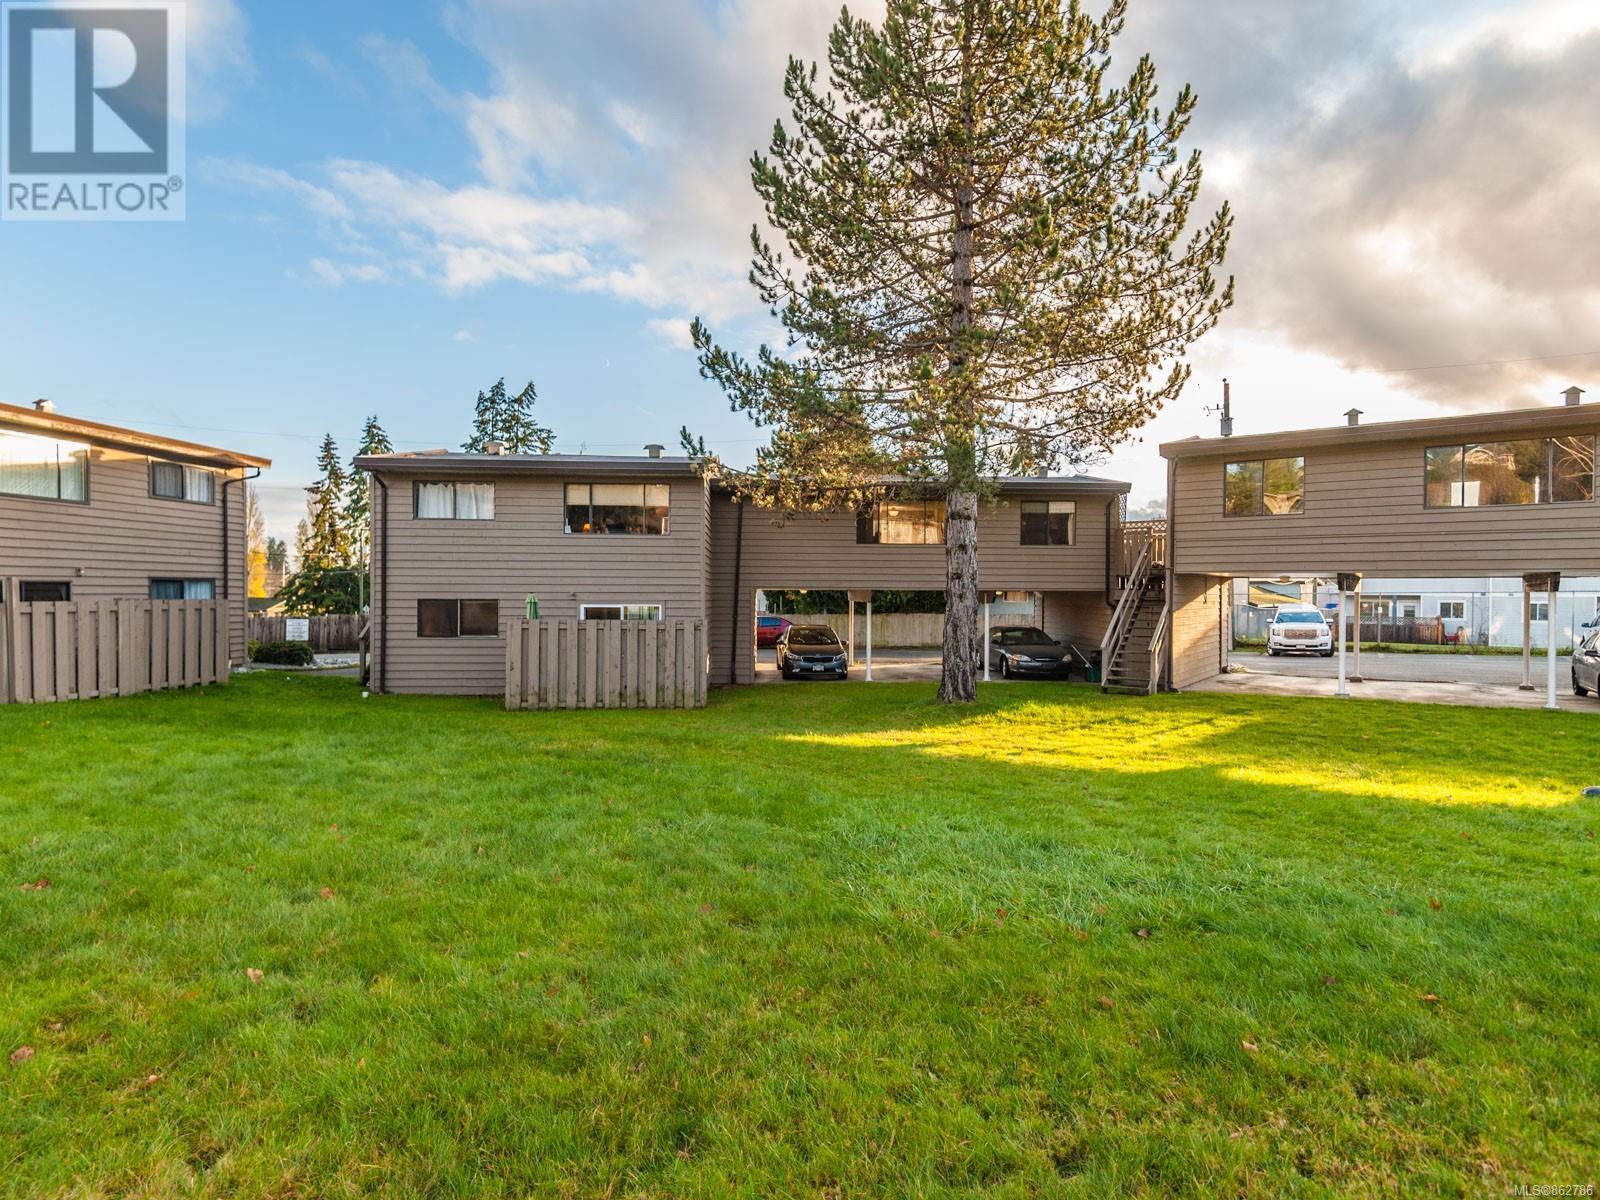 31 25 Pryde Ave, Nanaimo, British Columbia  V9S 4R5 - Photo 20 - 862786